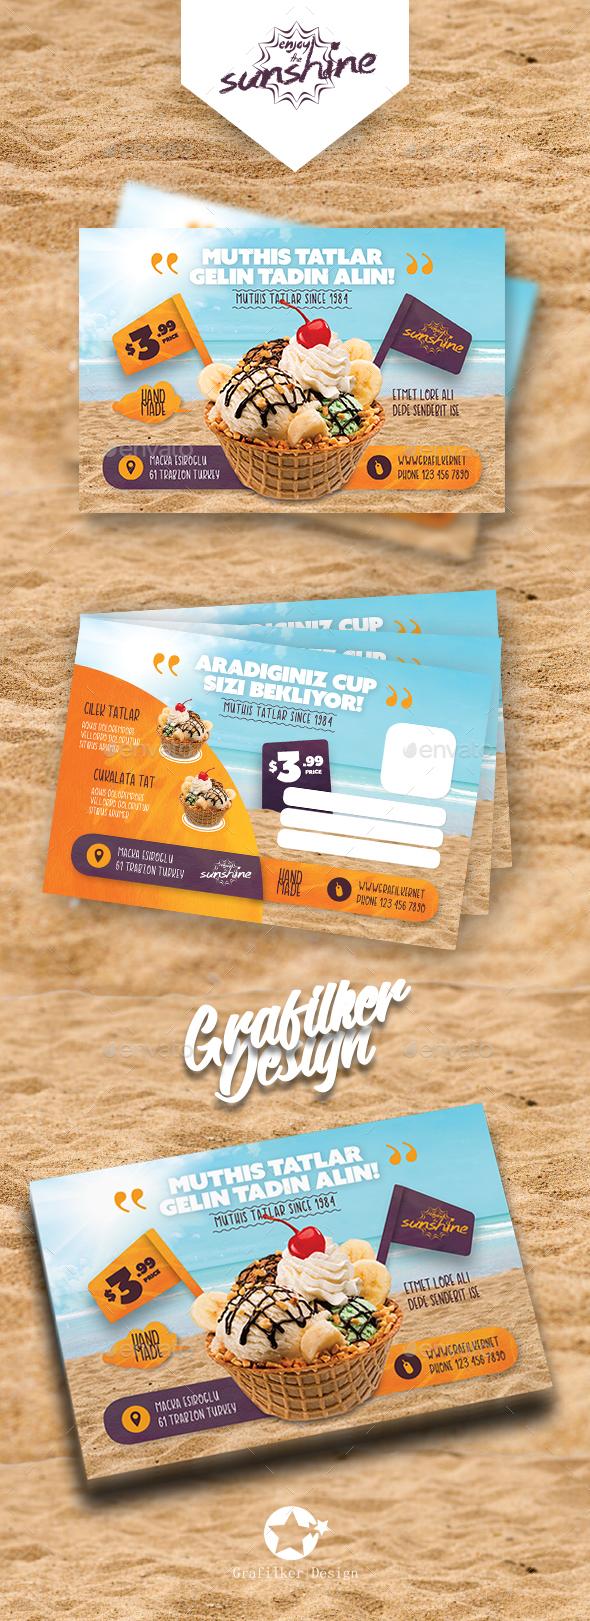 Ice Cream Postcard Templates by grafilker | GraphicRiver